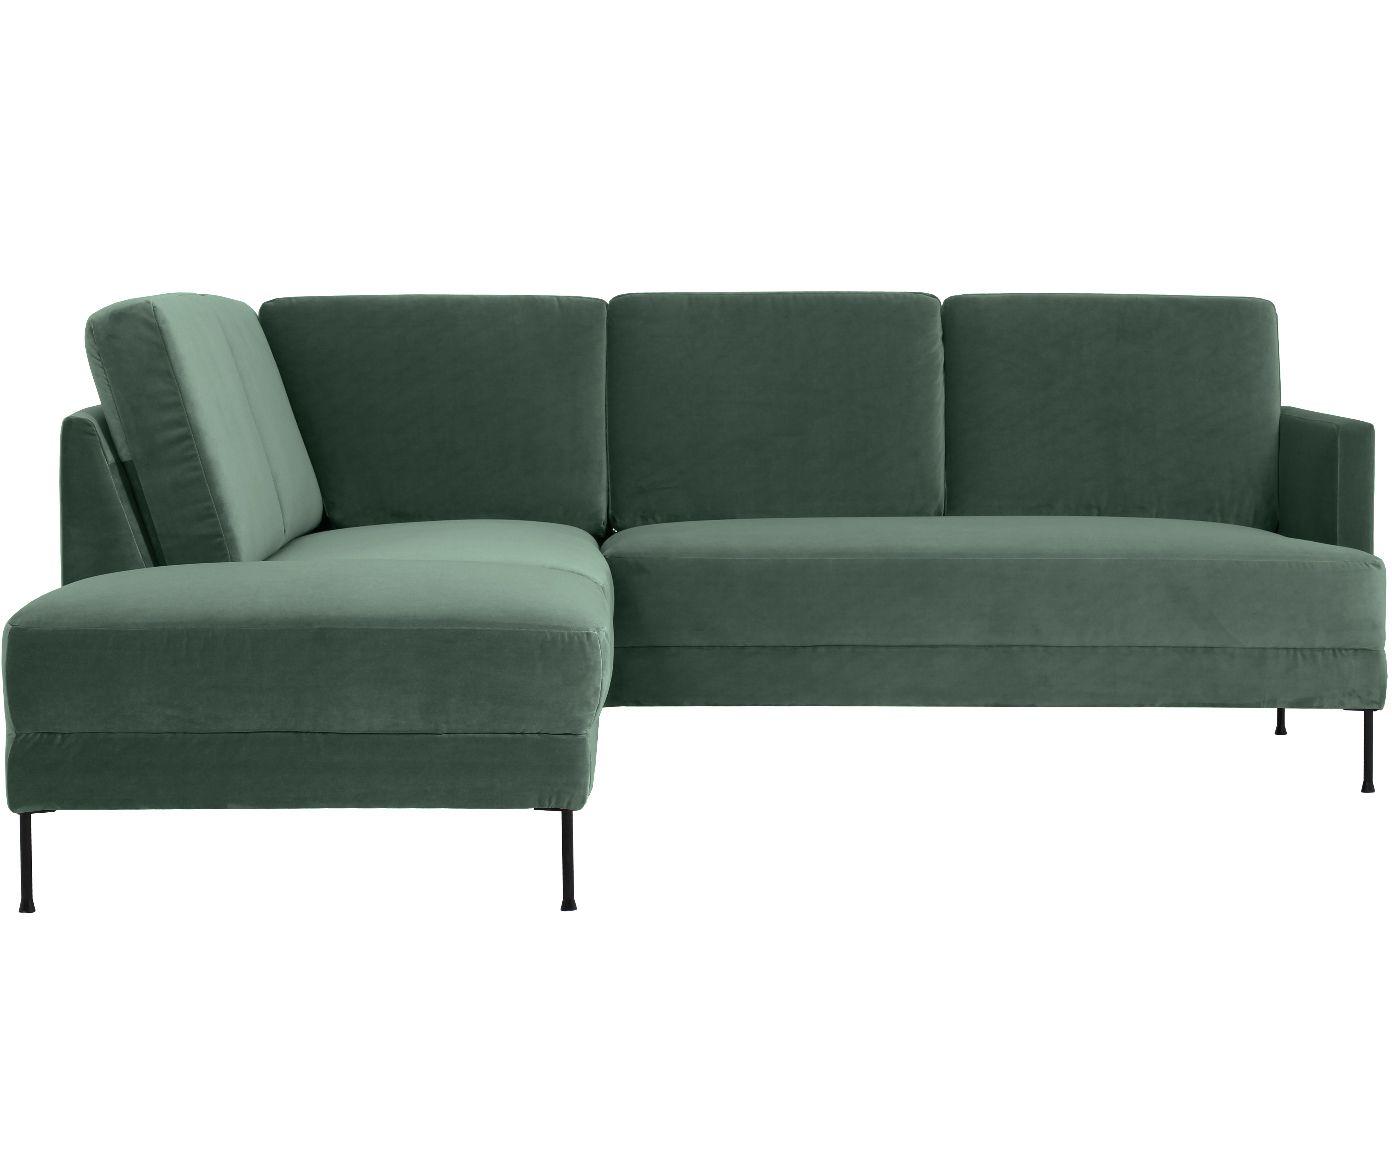 Samt Ecksofa Fluente In Grun Westwingnow Sofa Furniture Sofa Couch